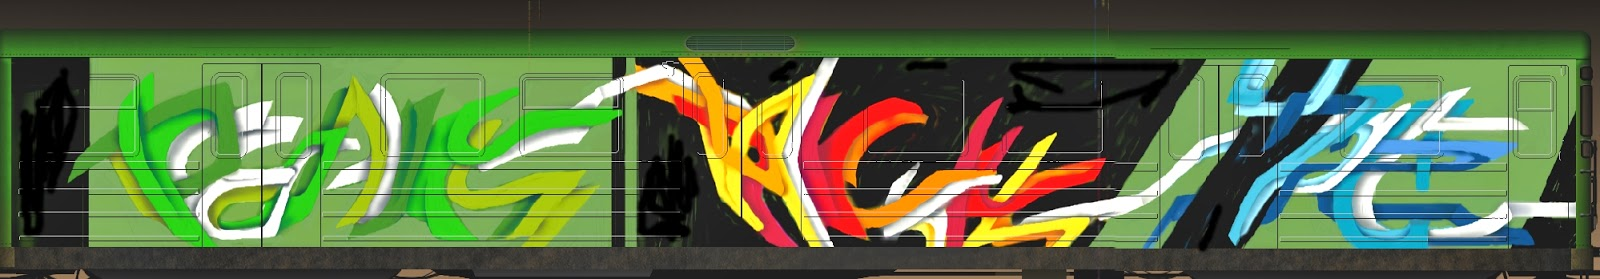 graffiti studio 3.0 para